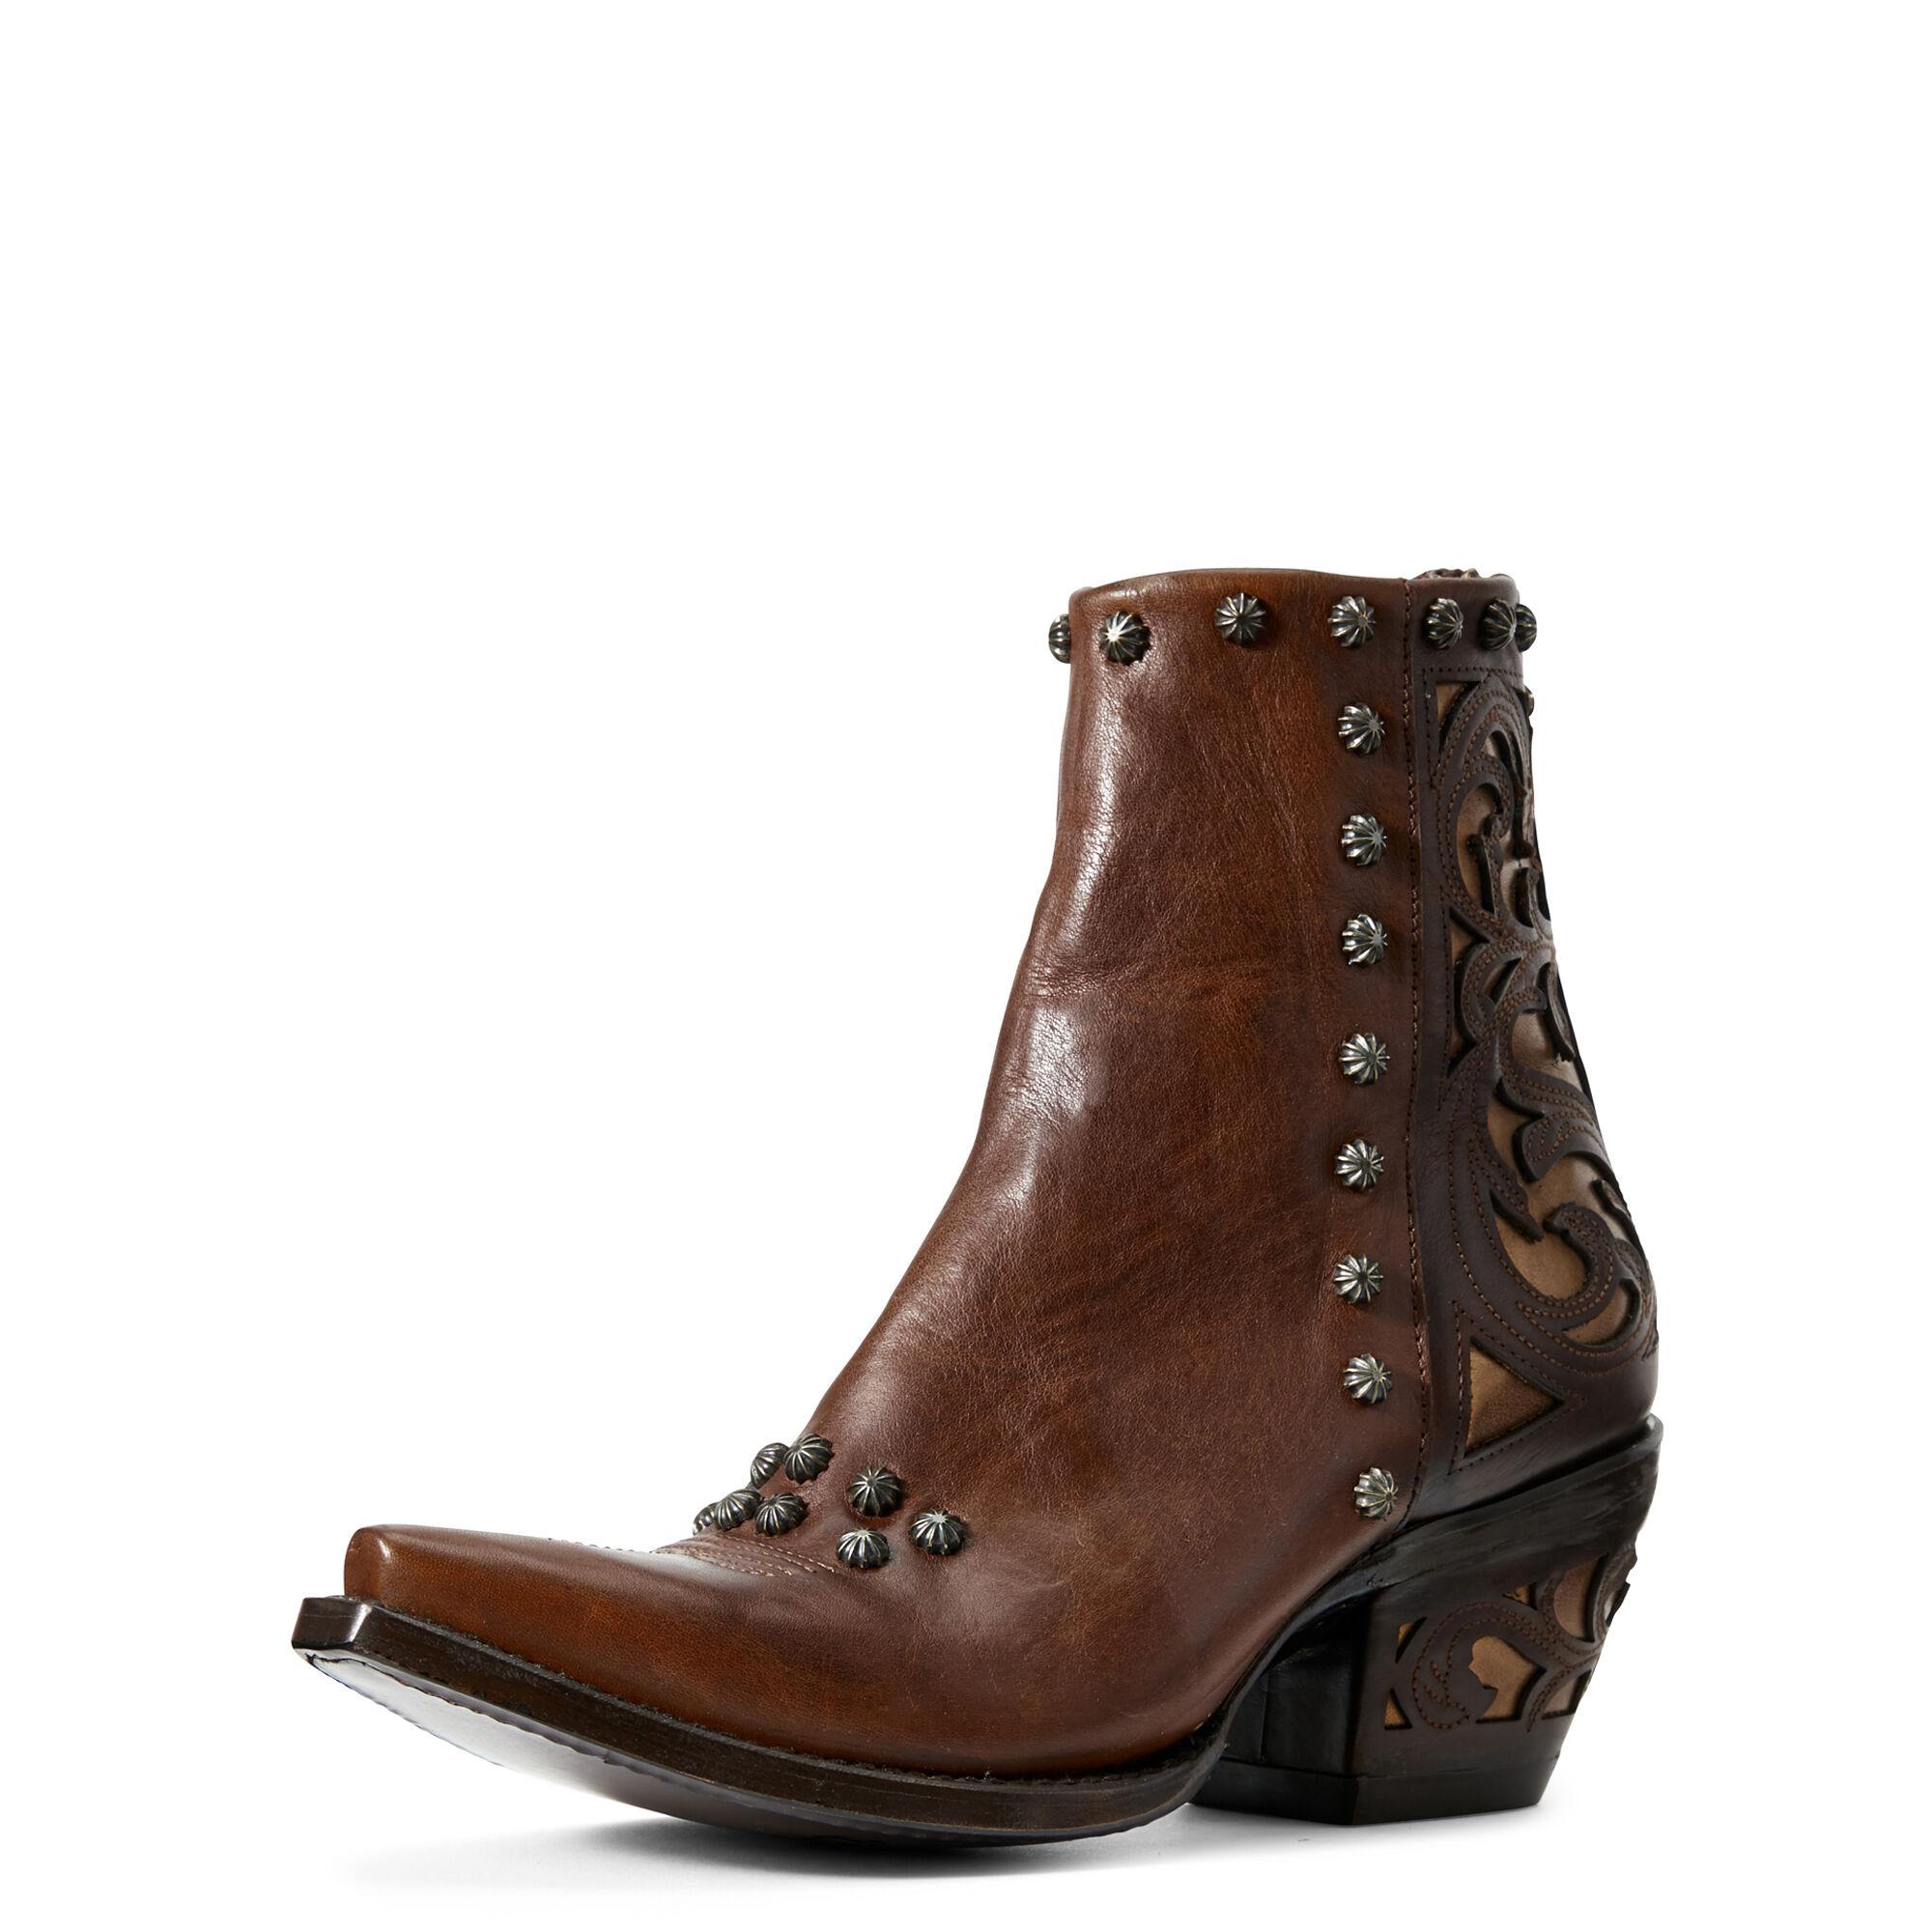 Ariat Diva Western Boots in Warm Cognac